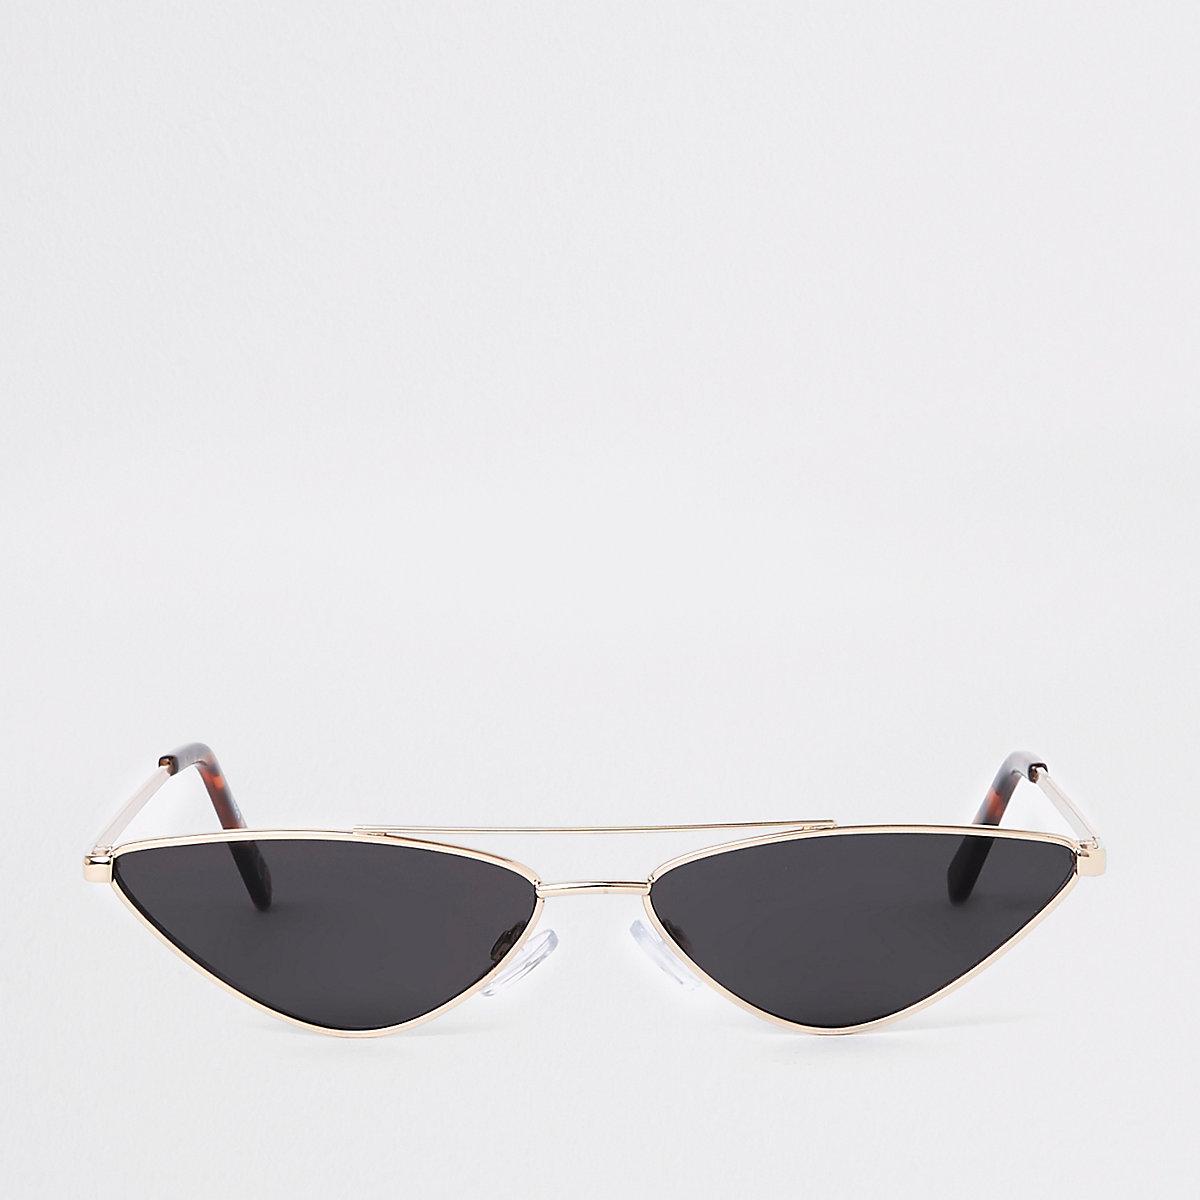 Gold metal frame slim sunglasses